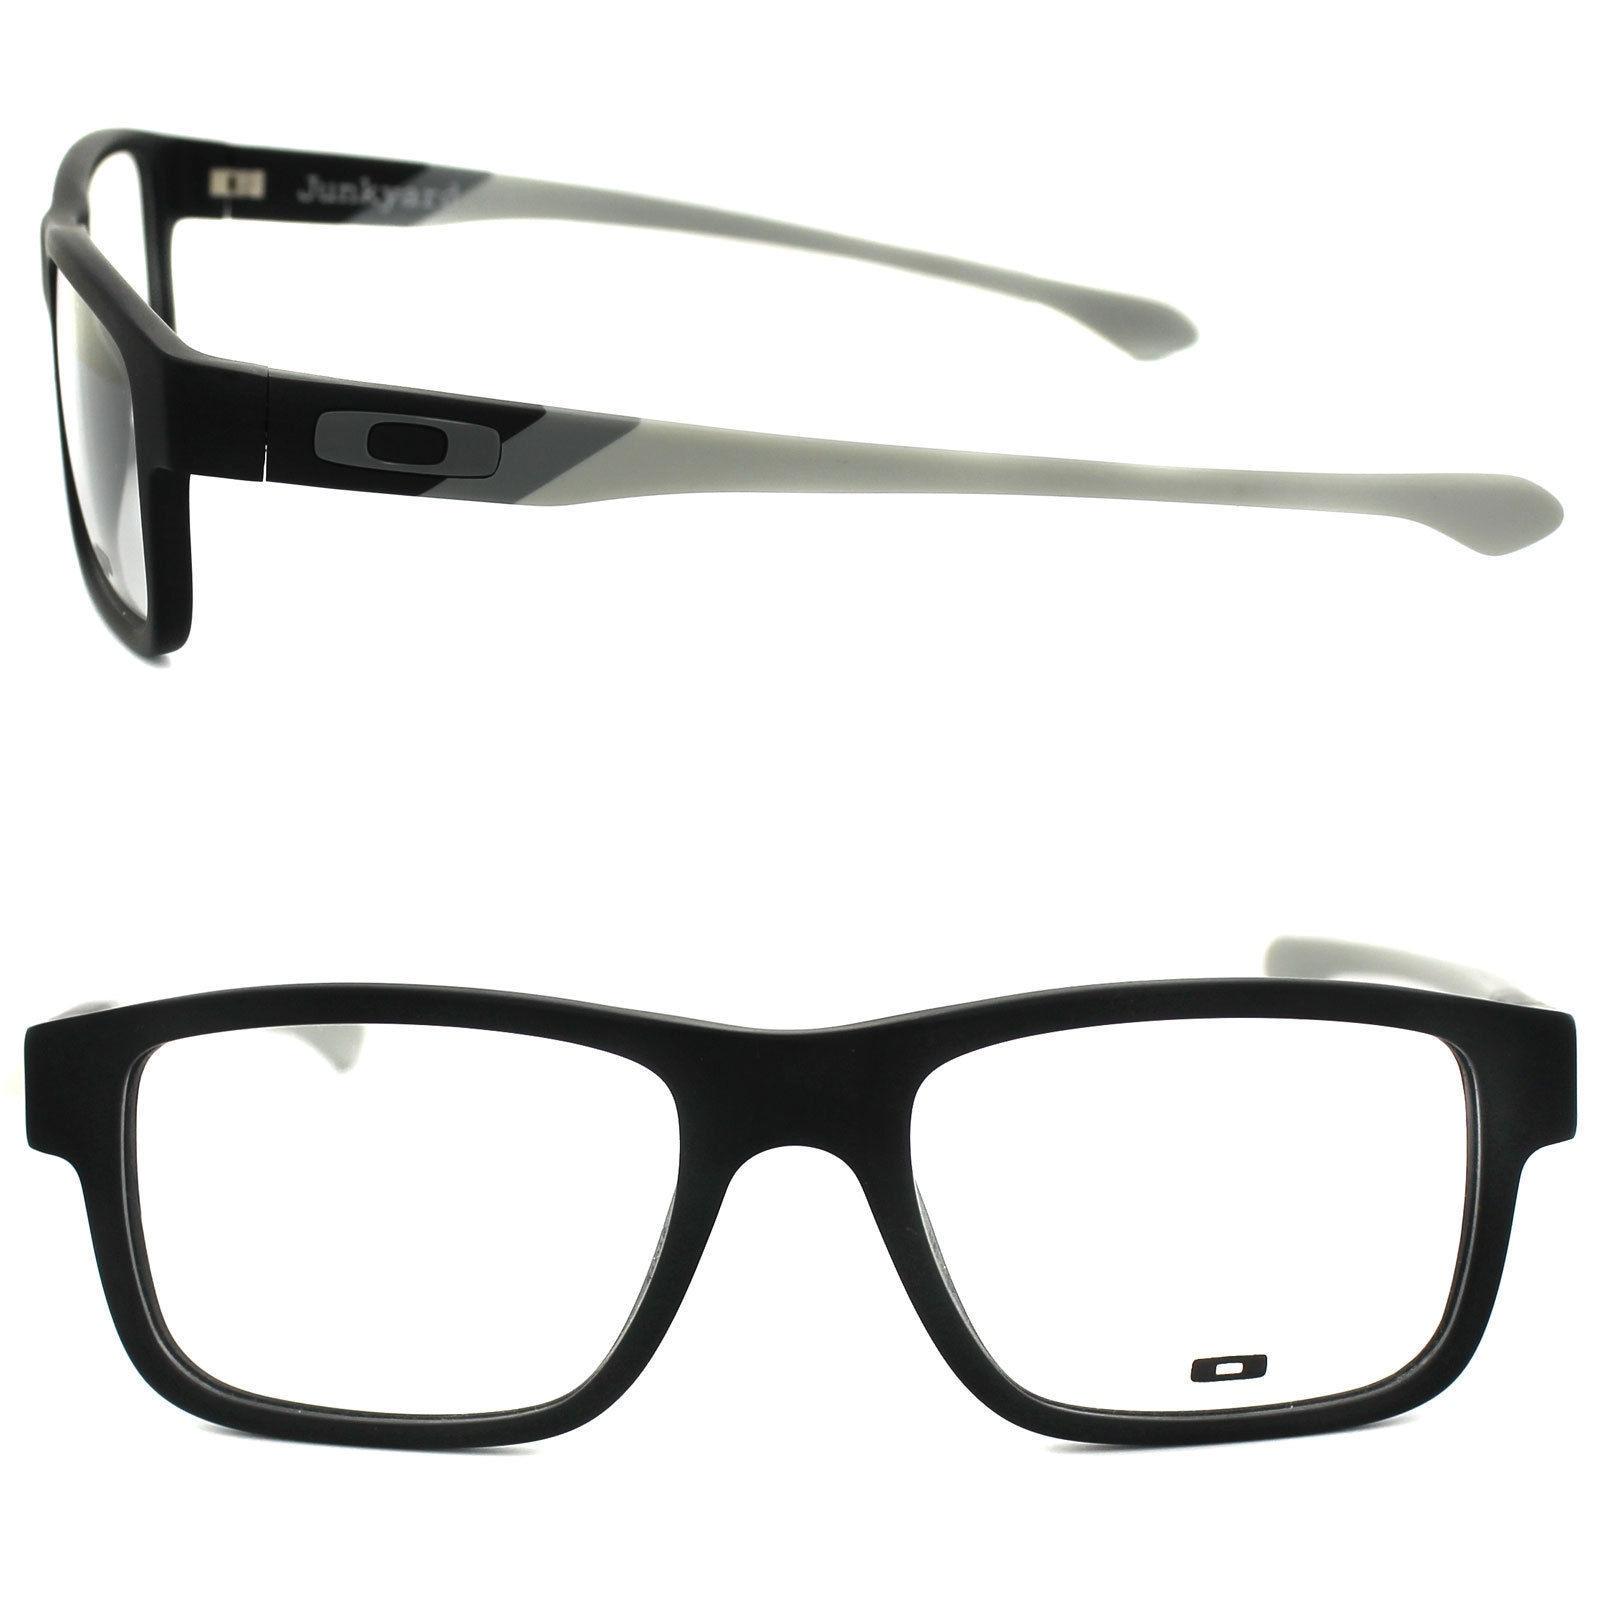 Oakley Junkyard OX1074 Eyeglasses Black Grey Frame Free